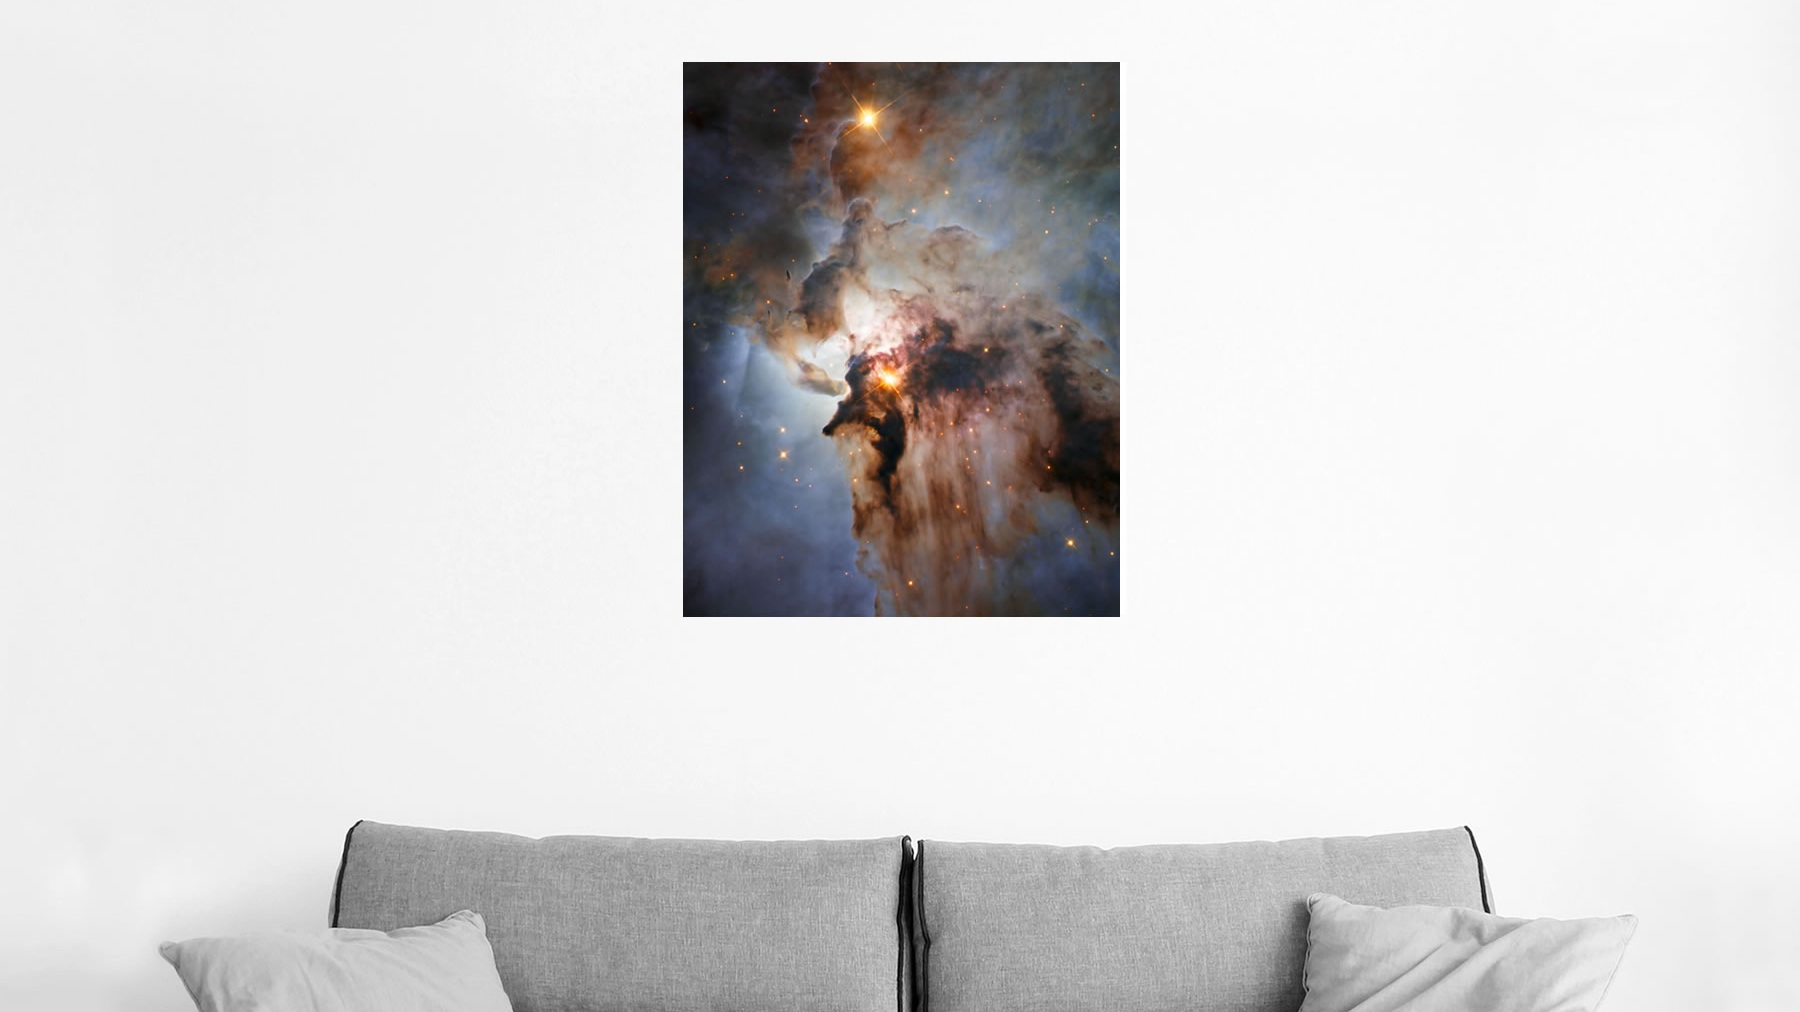 stormyseas_18x24_poster.jpg